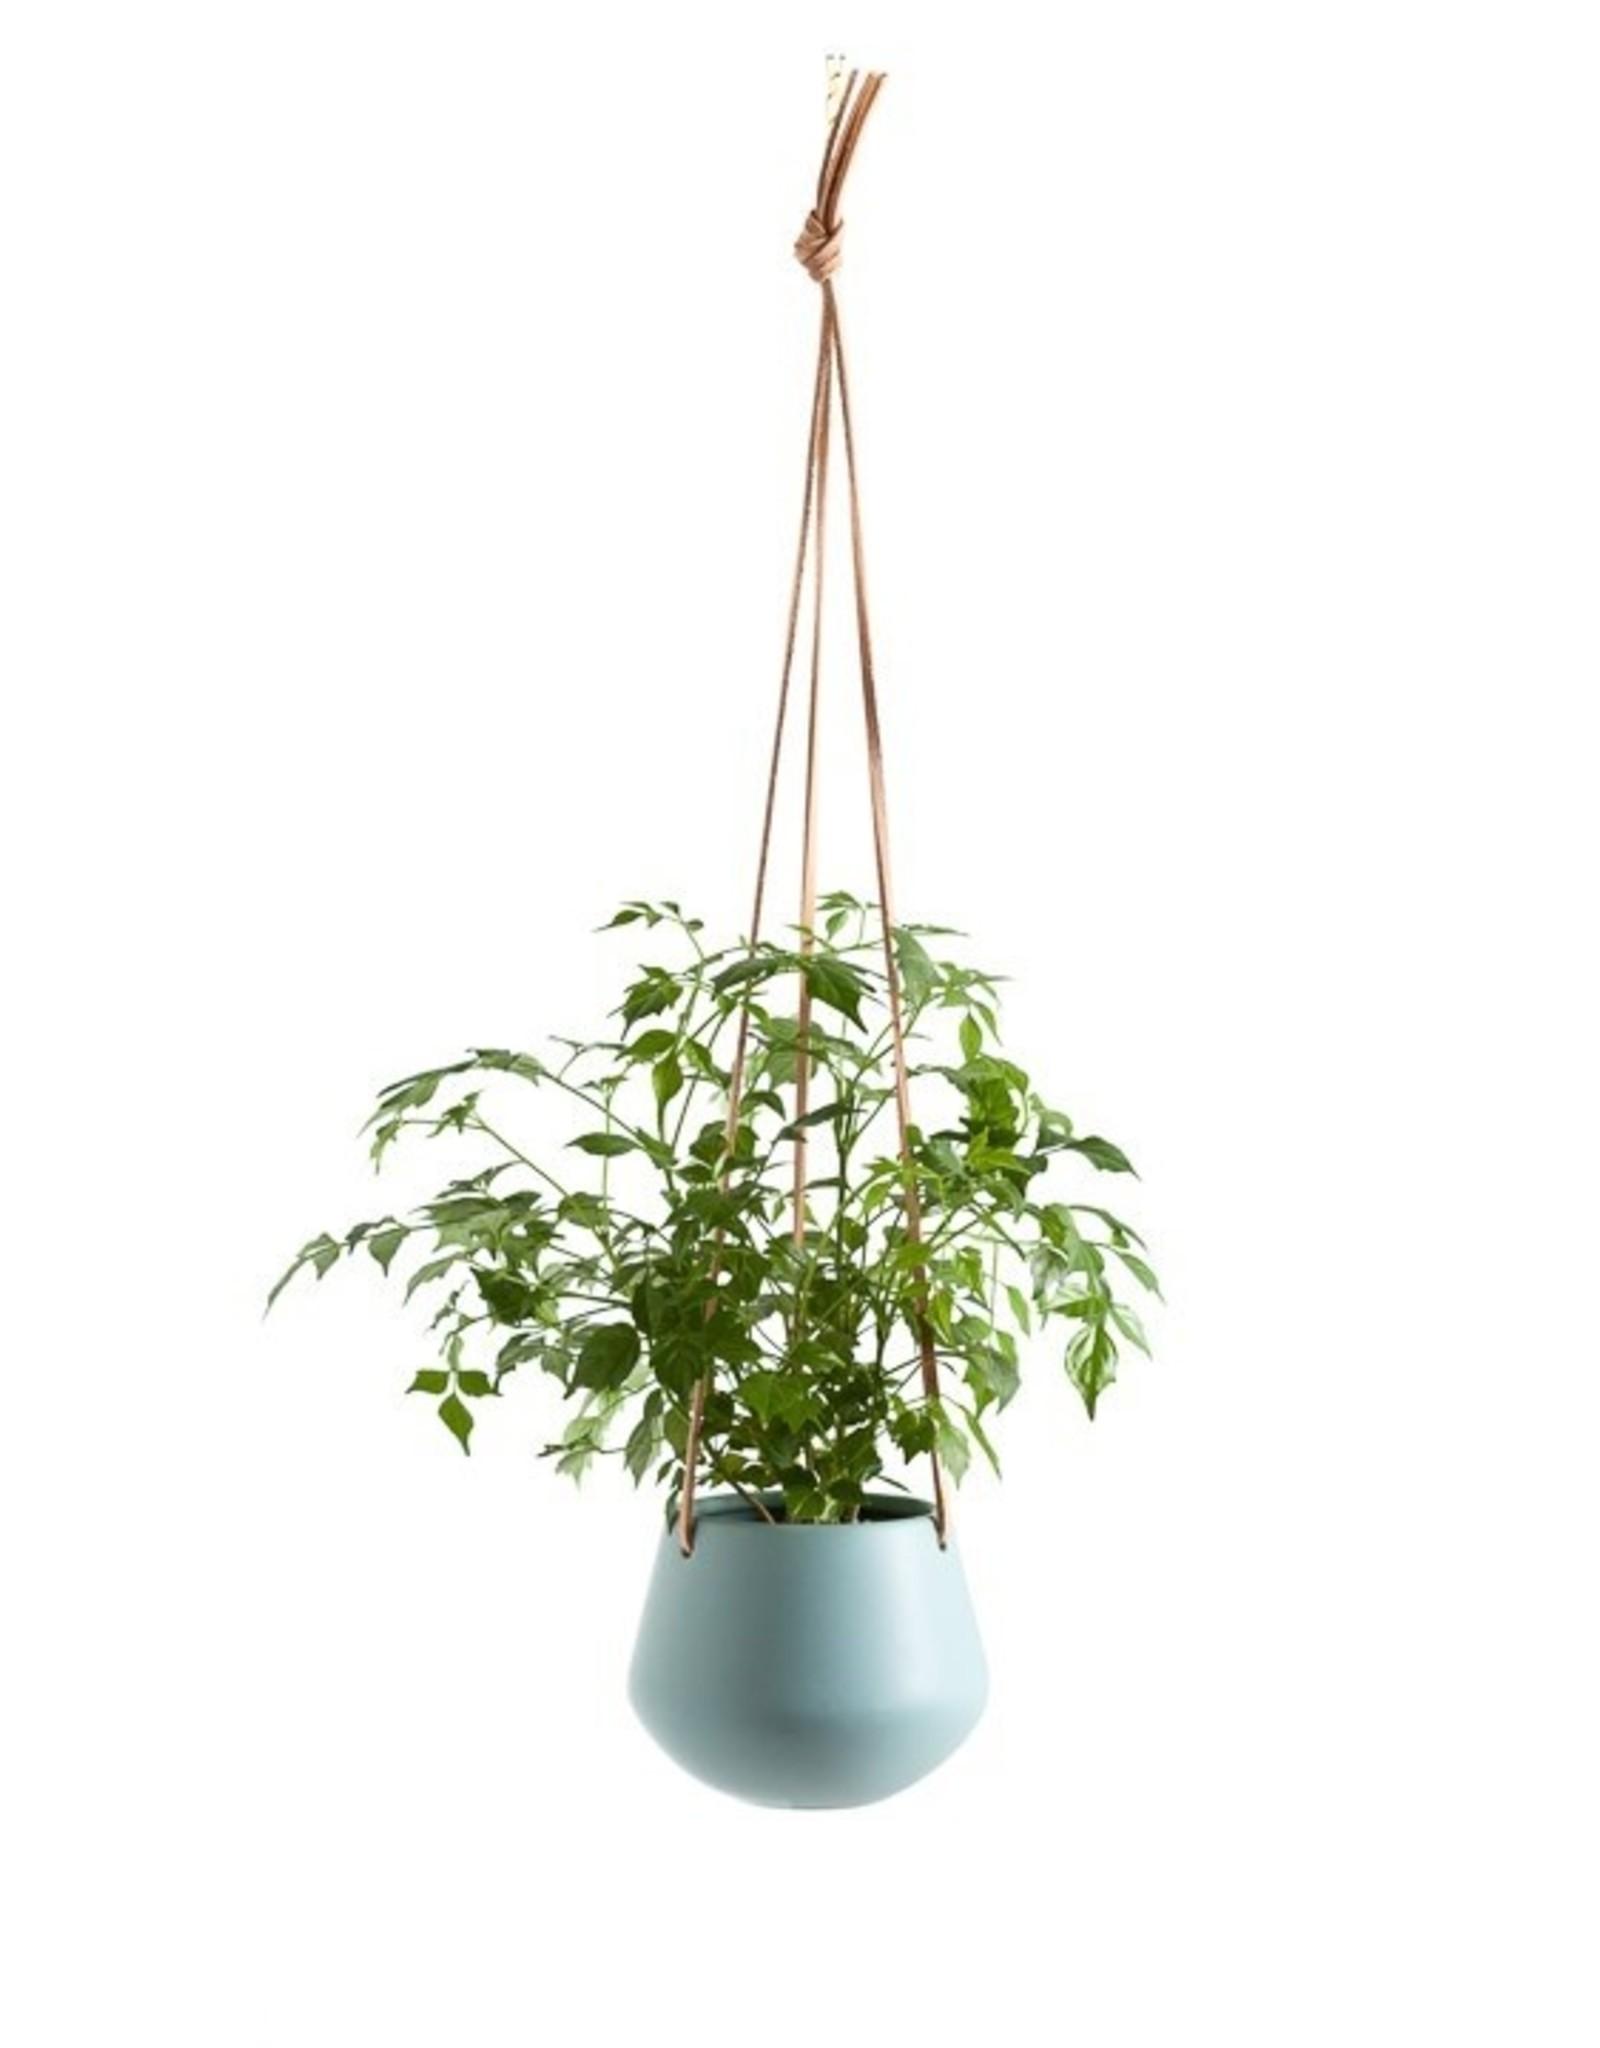 "Planter Torre & Tagus Hanging Ceramic Ashbury Teal 5"" 902921A"